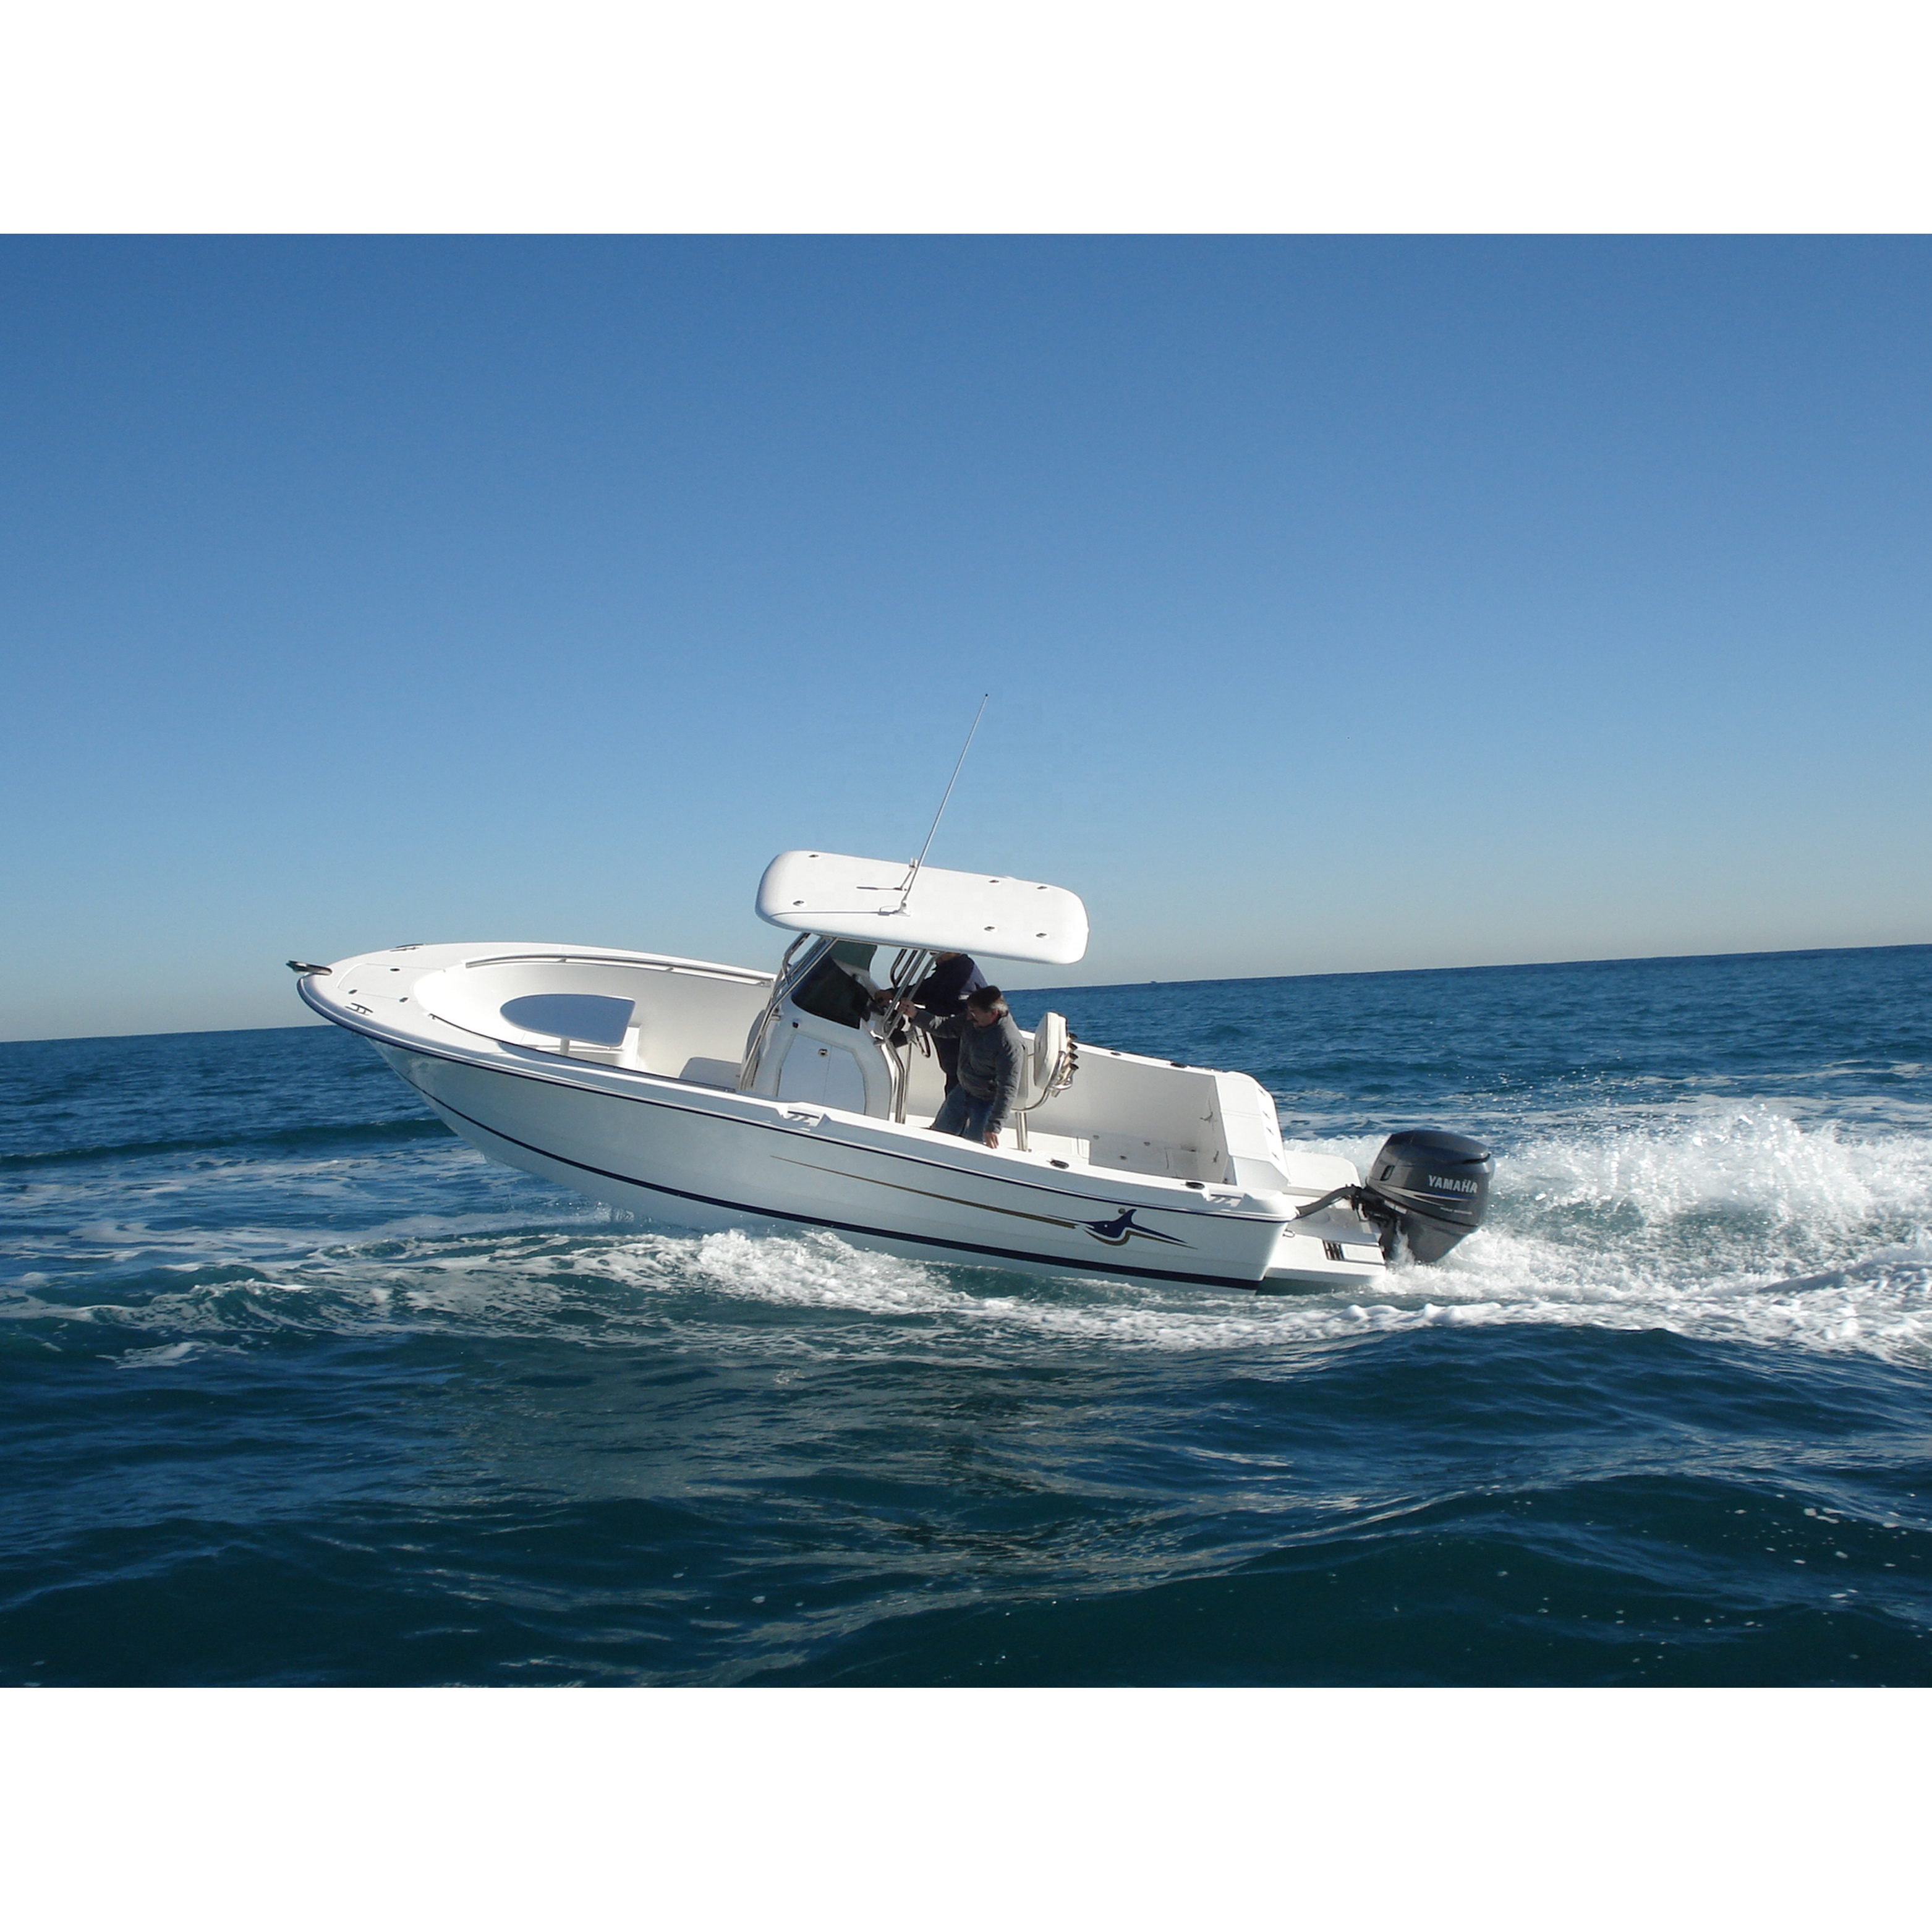 Oceania 22cc Fiberglass Sport Fishing Boat Buy Yacht Cruiser Sport Fishing Boat Luxury Leisure Sport Fiberglass Boat Luxury Sport Fishing Boat